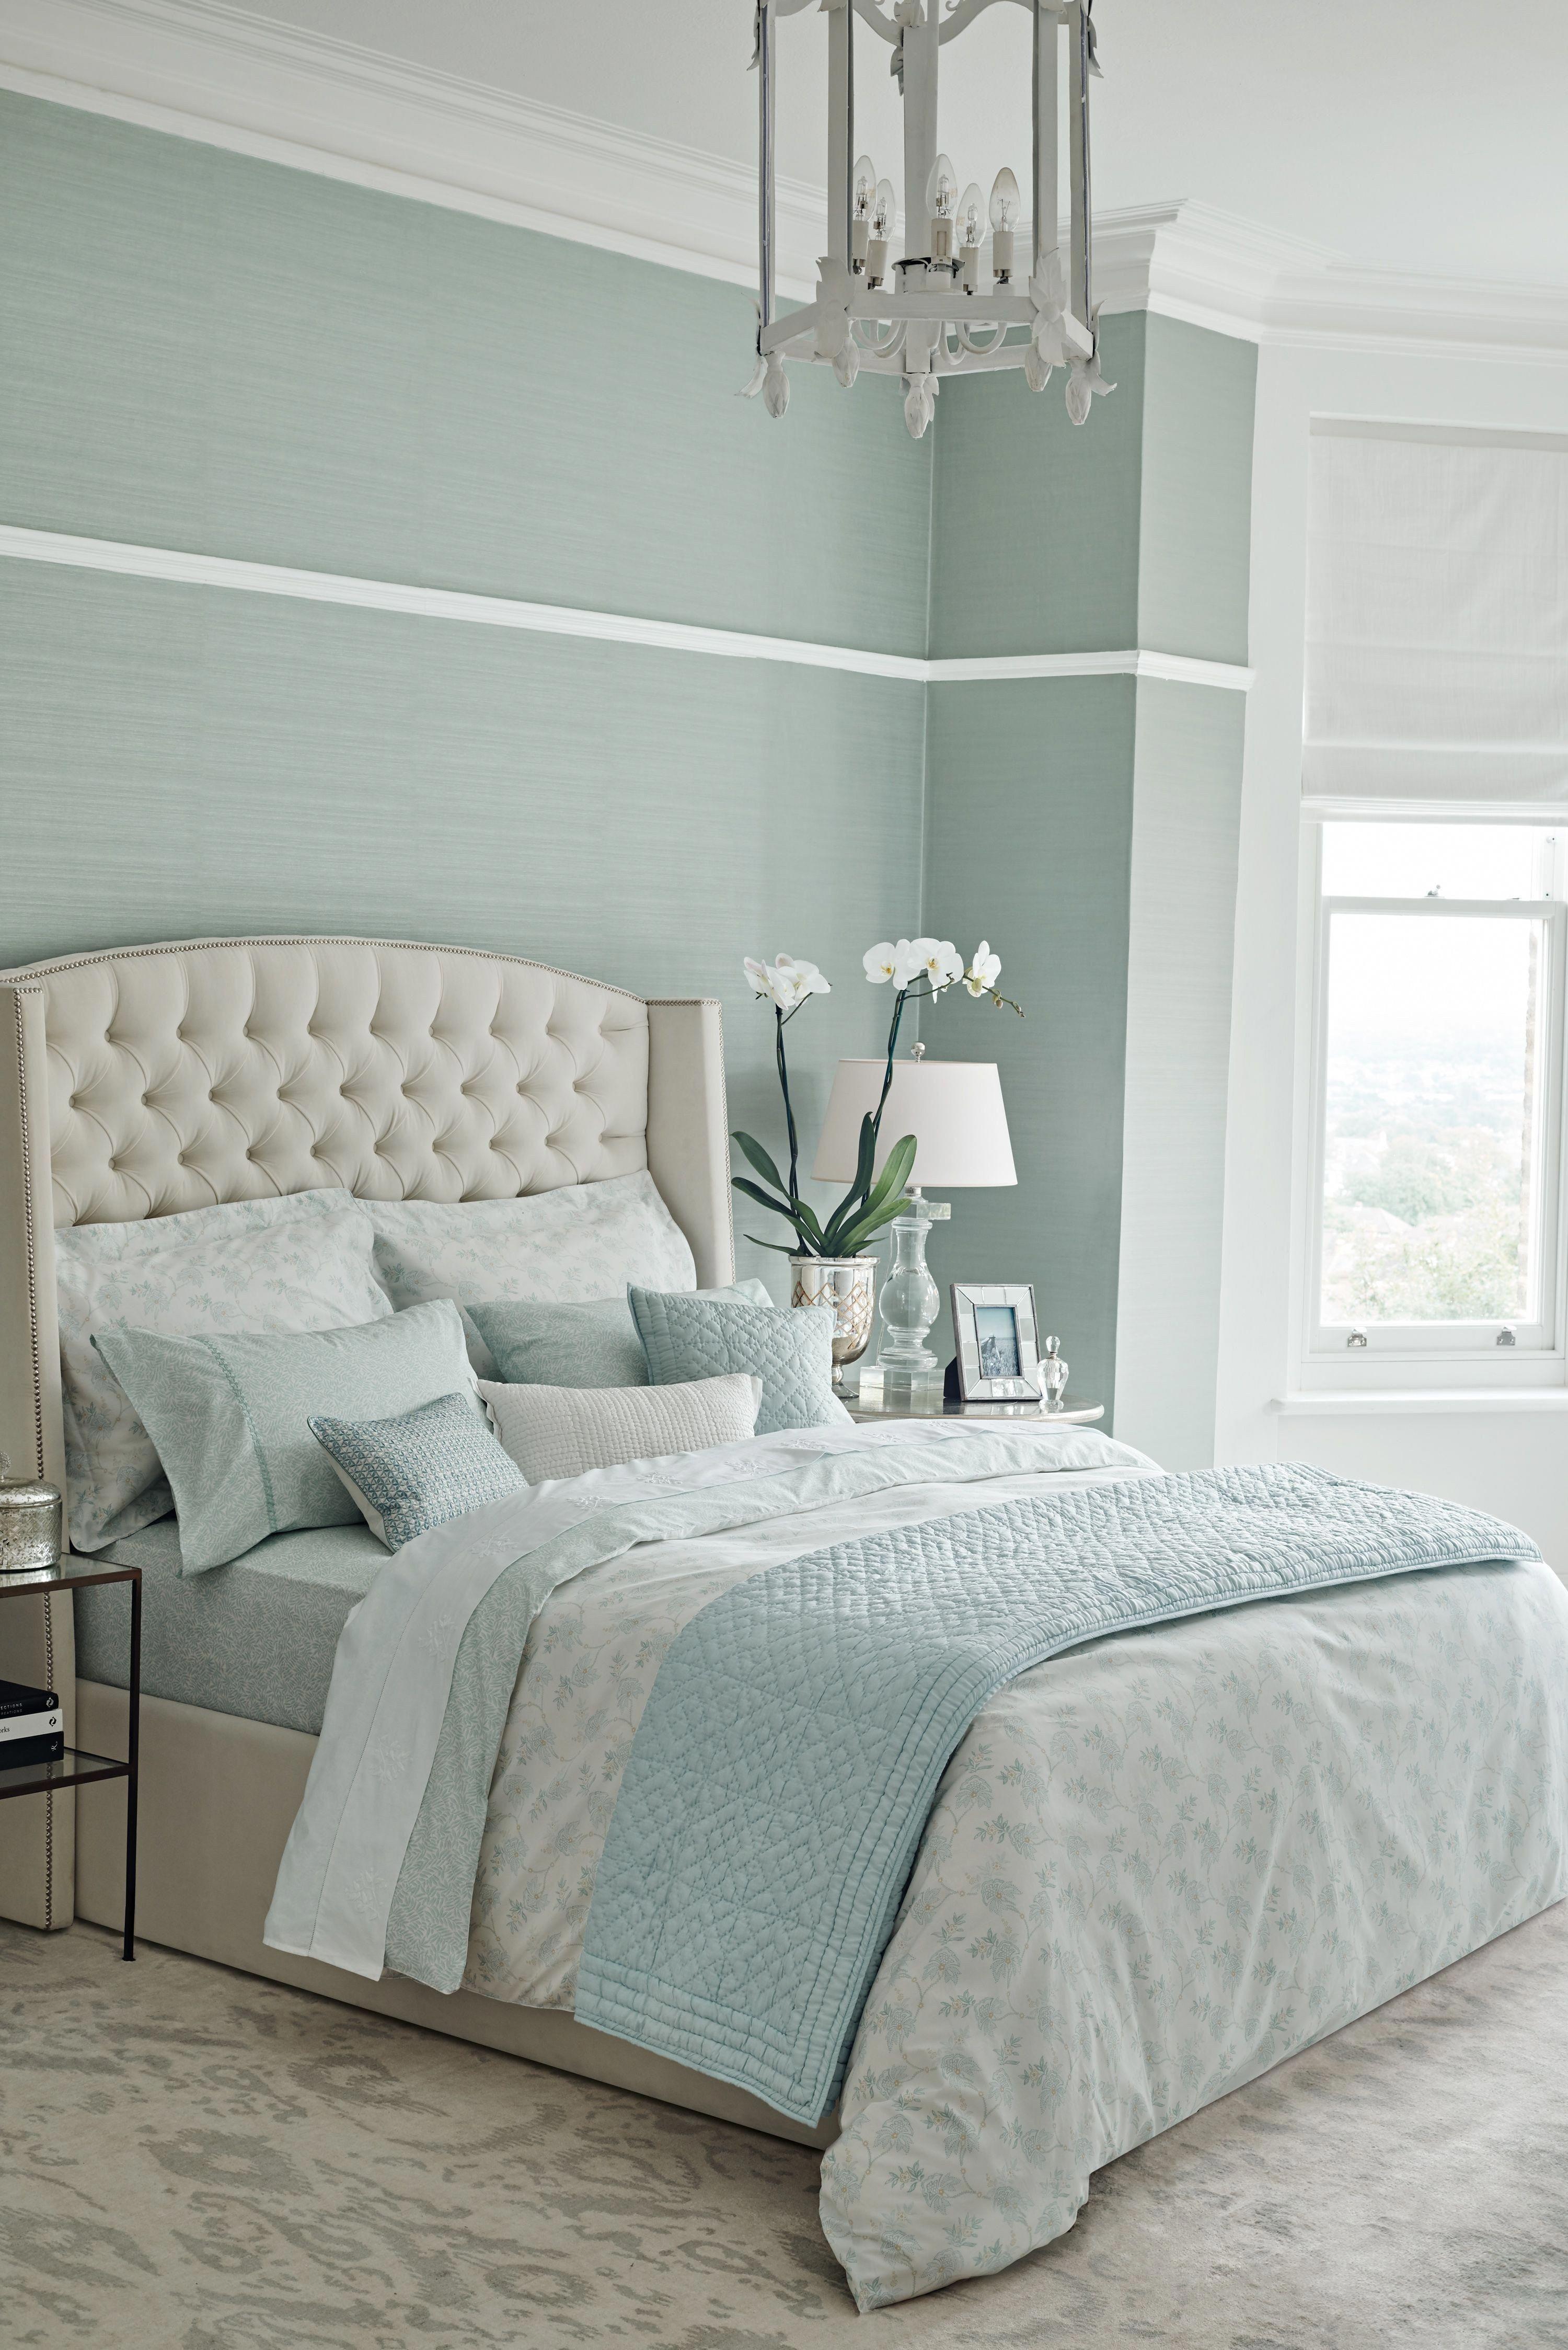 Elegant Gray And Tiffany Blue Bedroom Small Bedroom Decor Woman Bedroom Master Bedrooms Decor